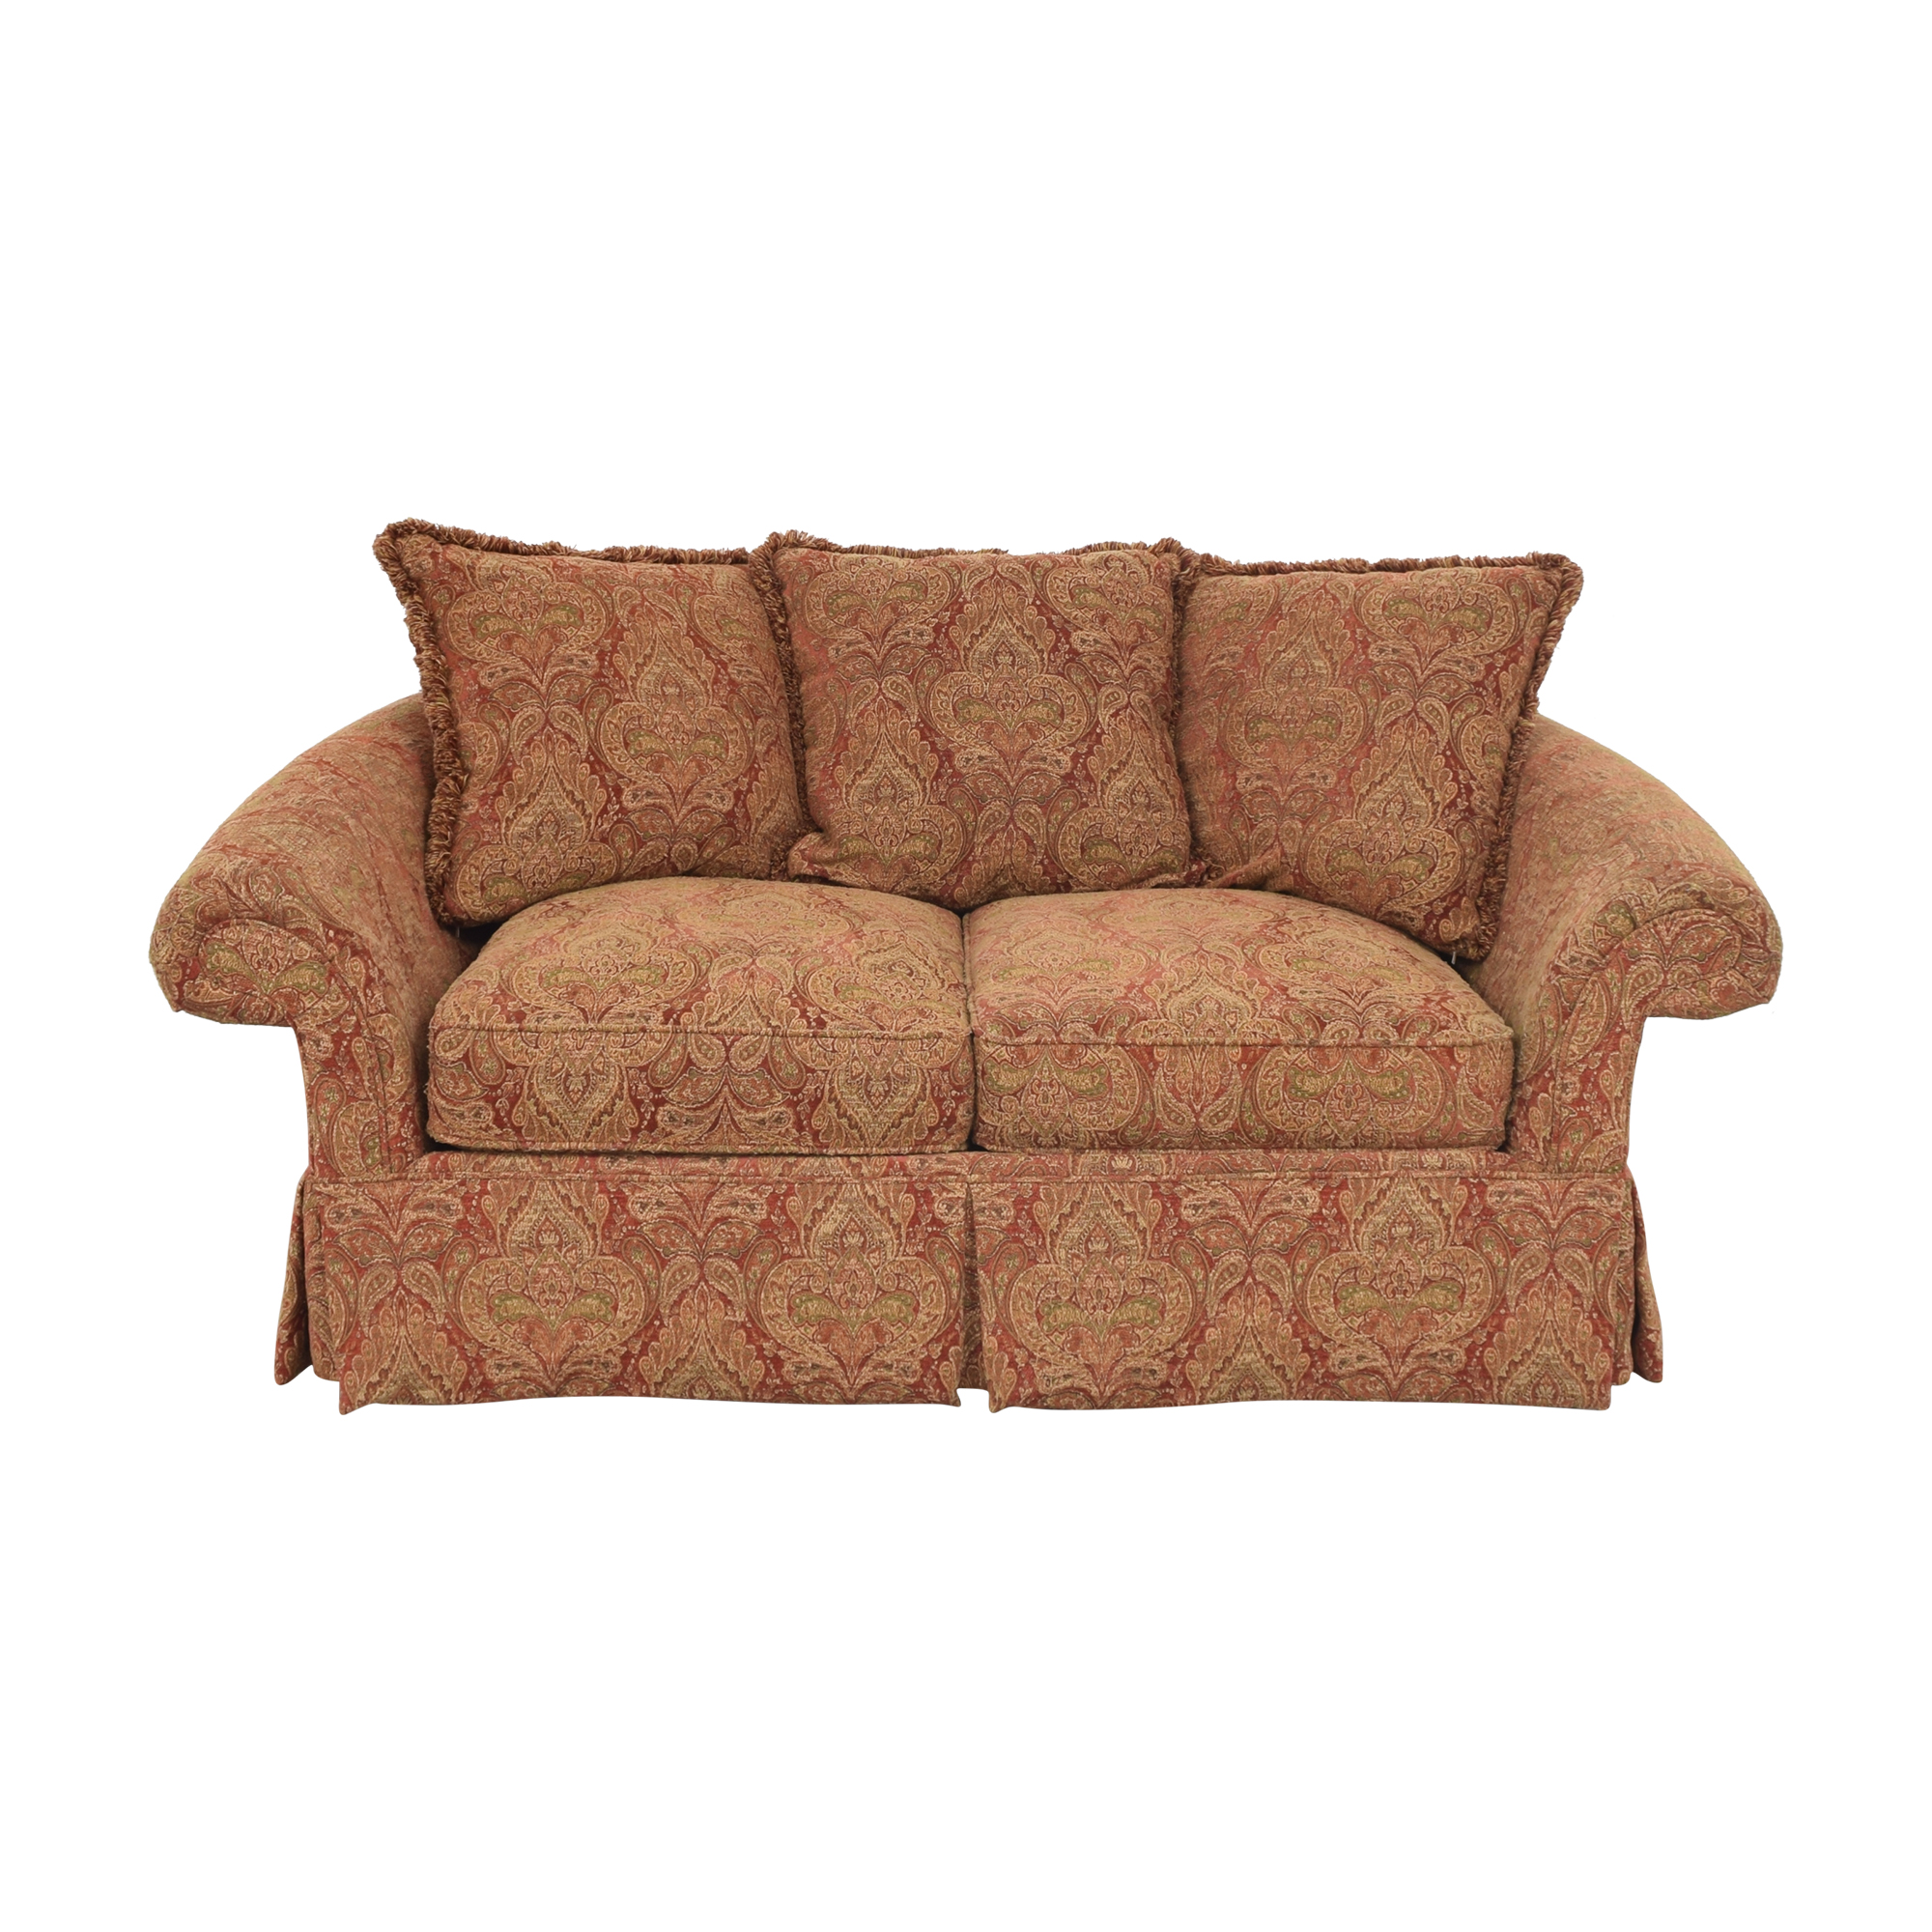 Raymour & Flanigan Raymour & Flanigan Two Cushion Skirted Sofa ma